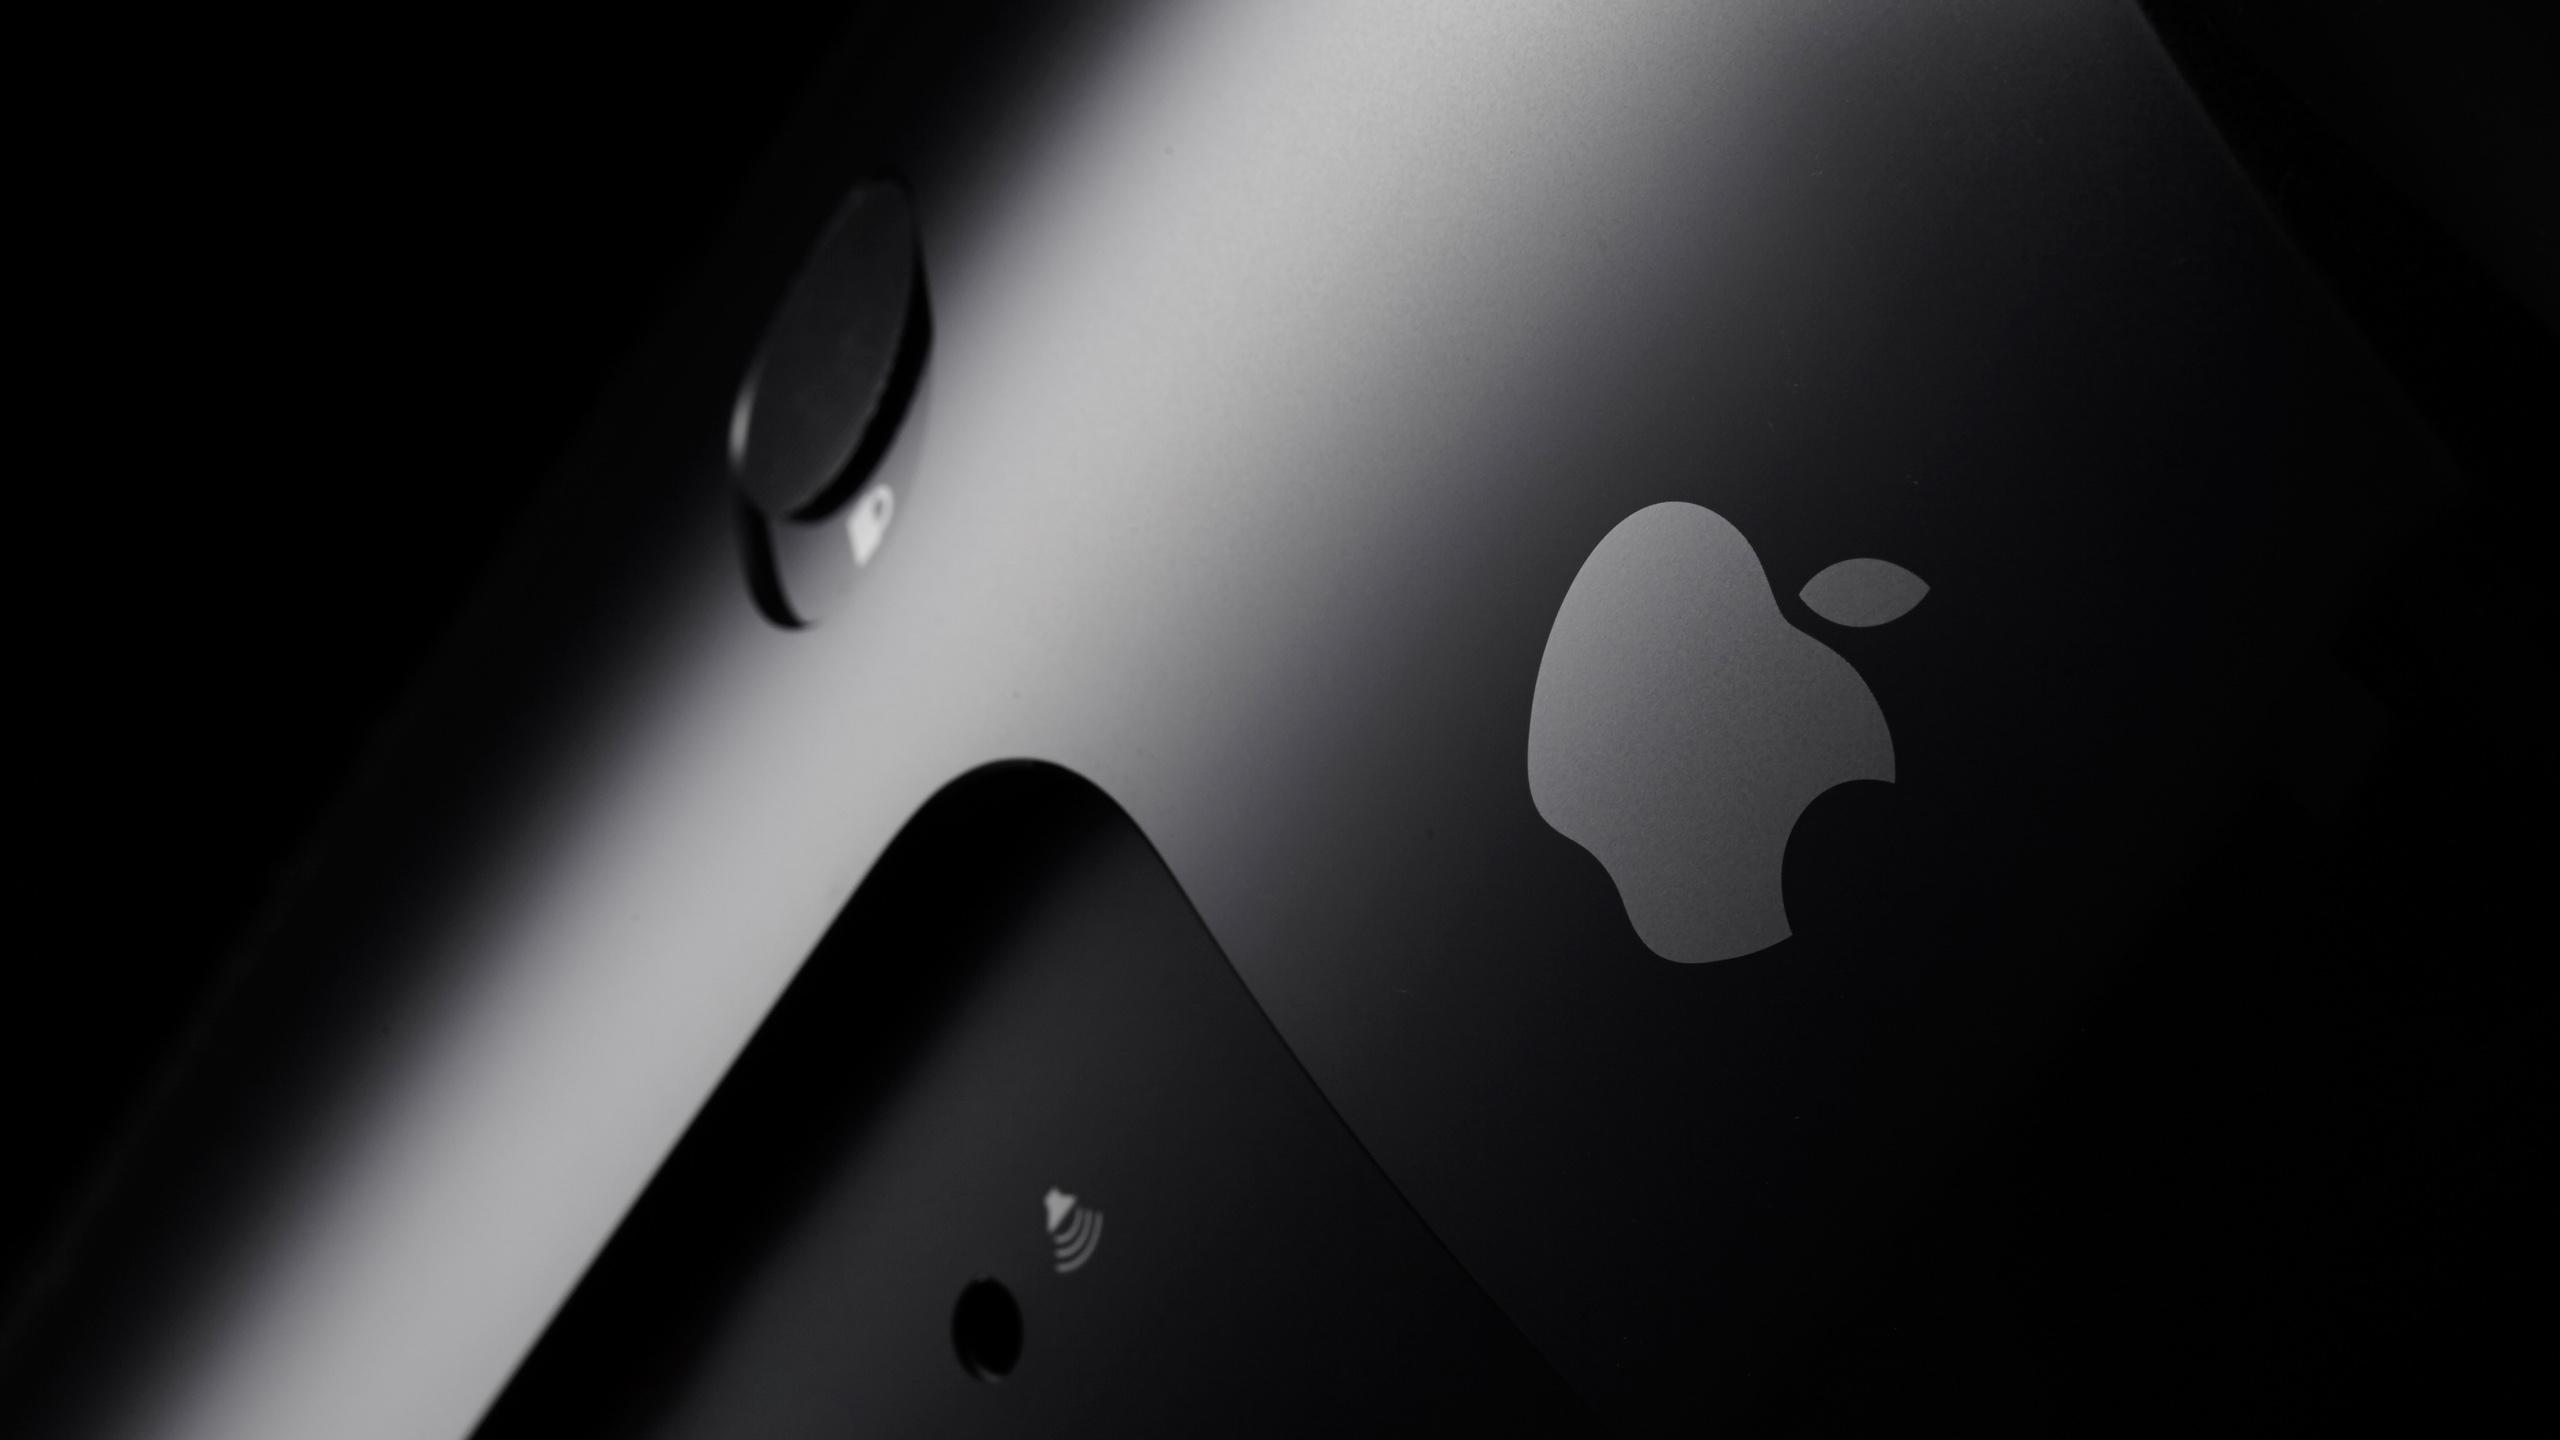 Mac Pro Apple Pro Display